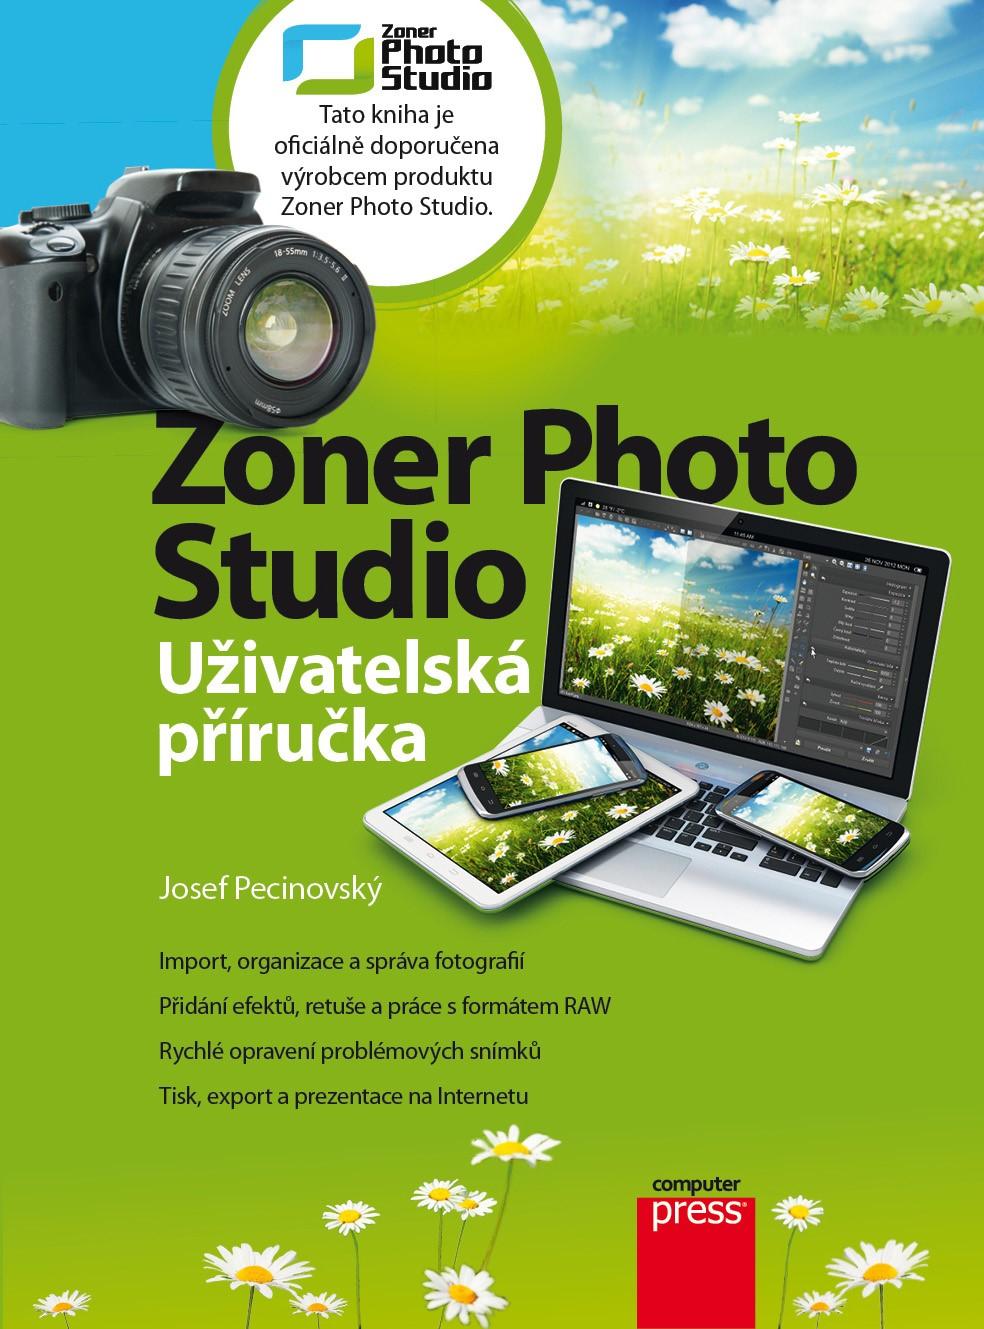 Zoner Photo Studio   Josef Pecinovský